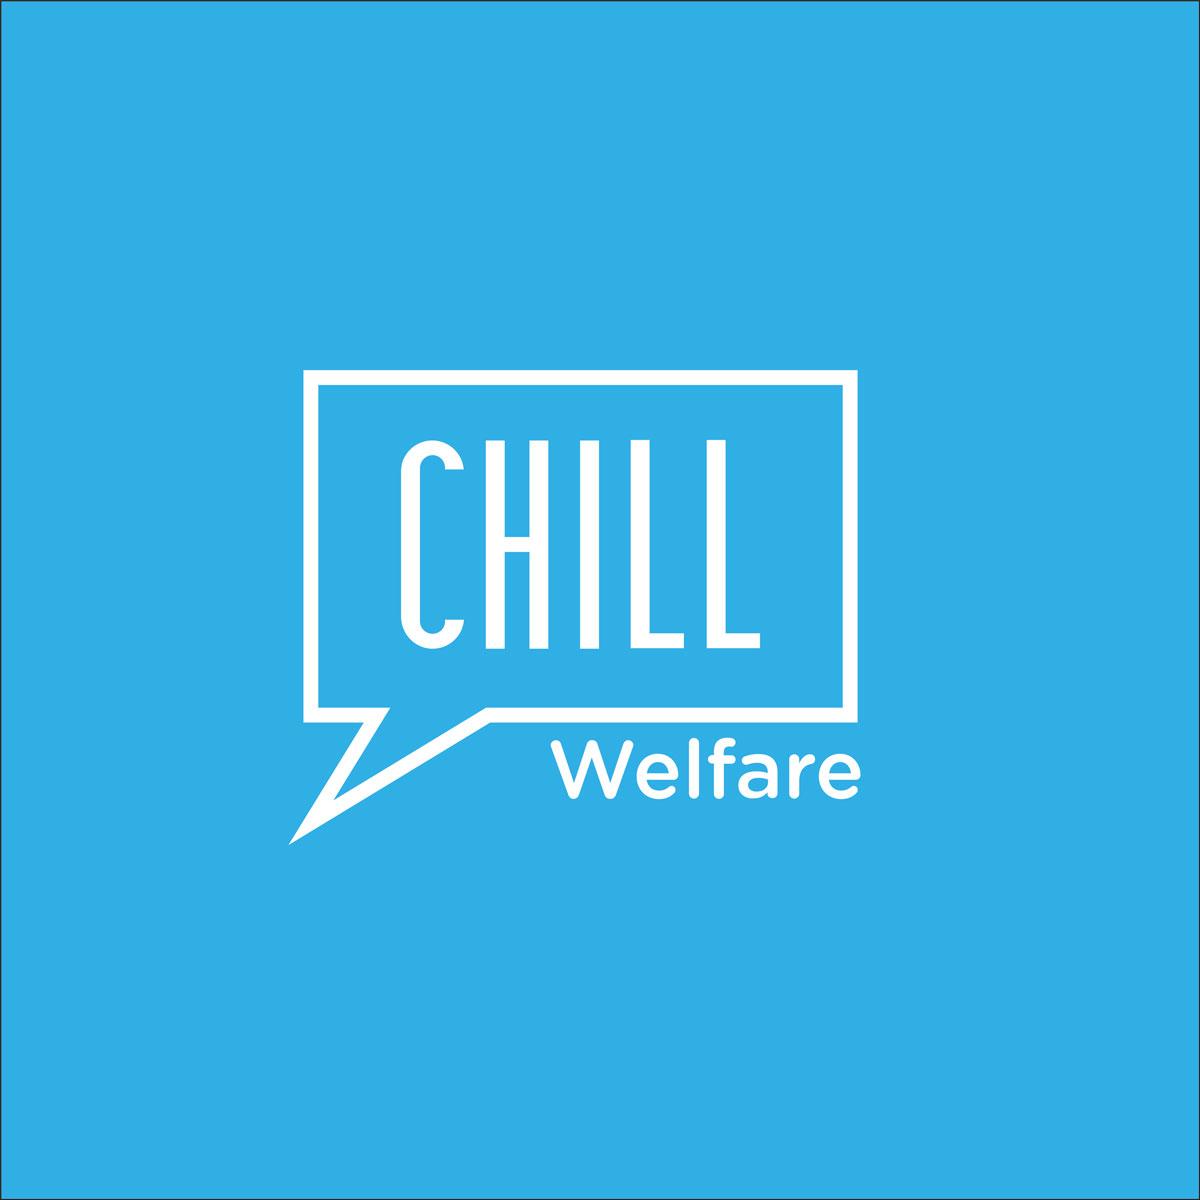 Chill Welfare -